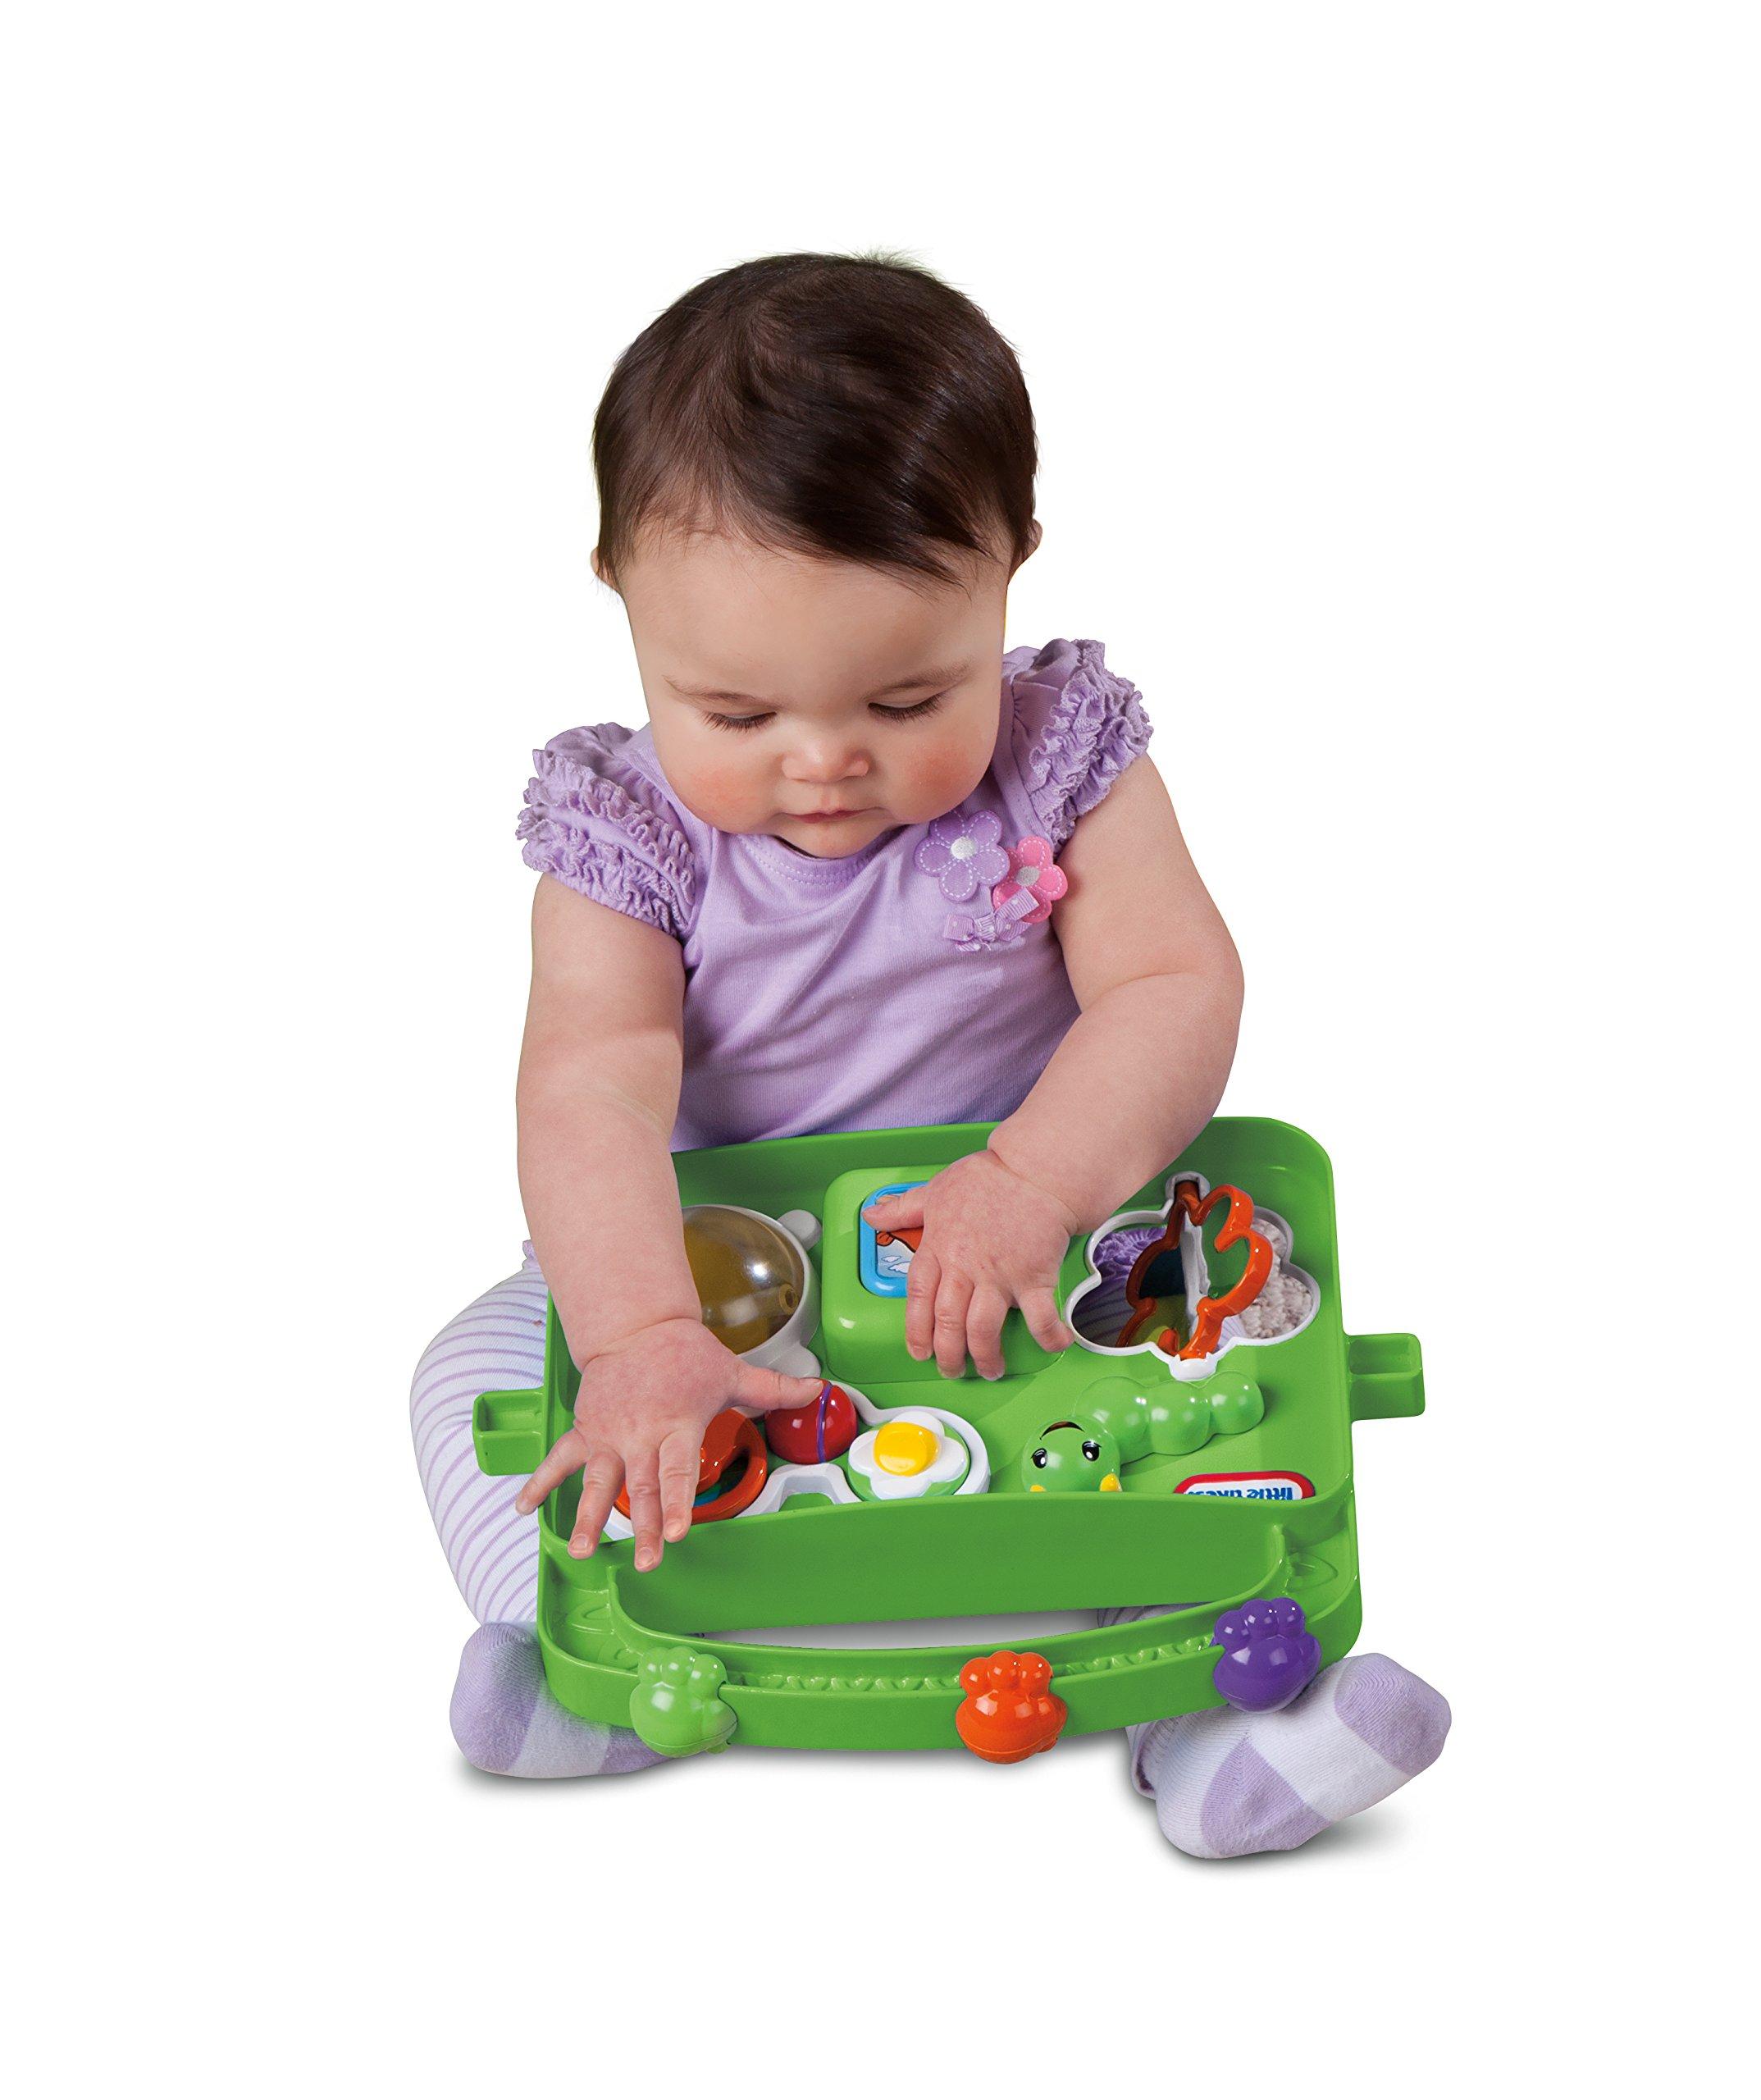 Little Tikes Activity Garden Baby Playset by Little Tikes